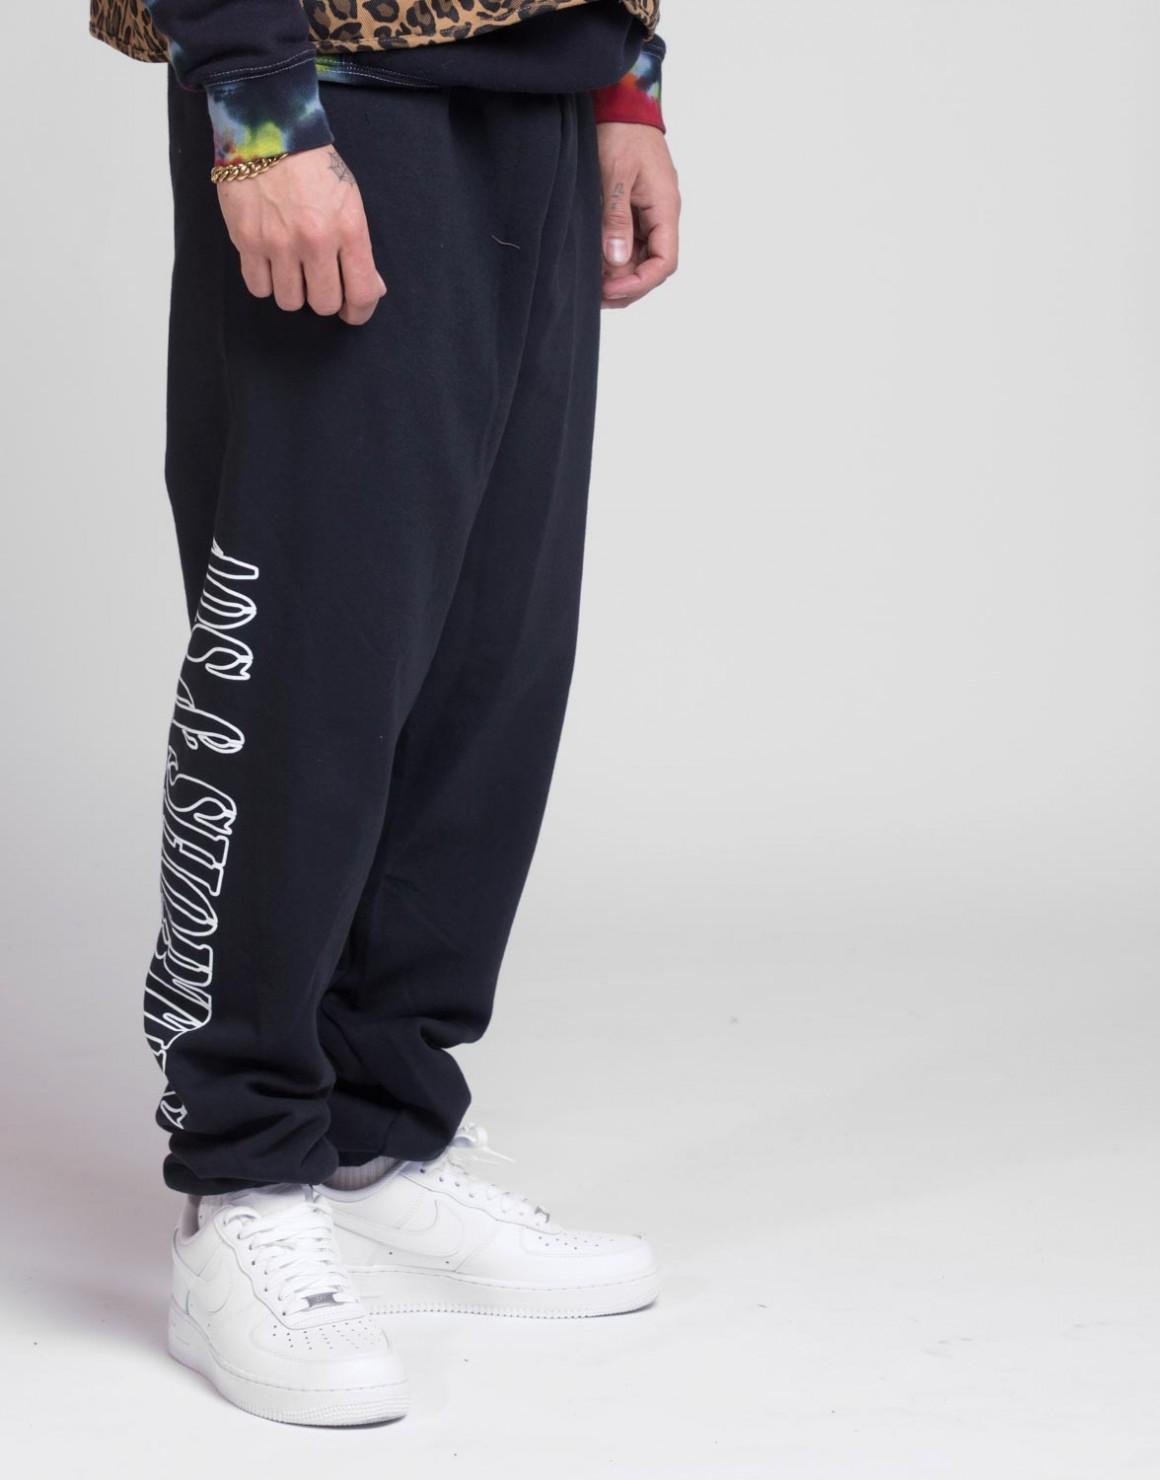 Working Title Sweat Pants